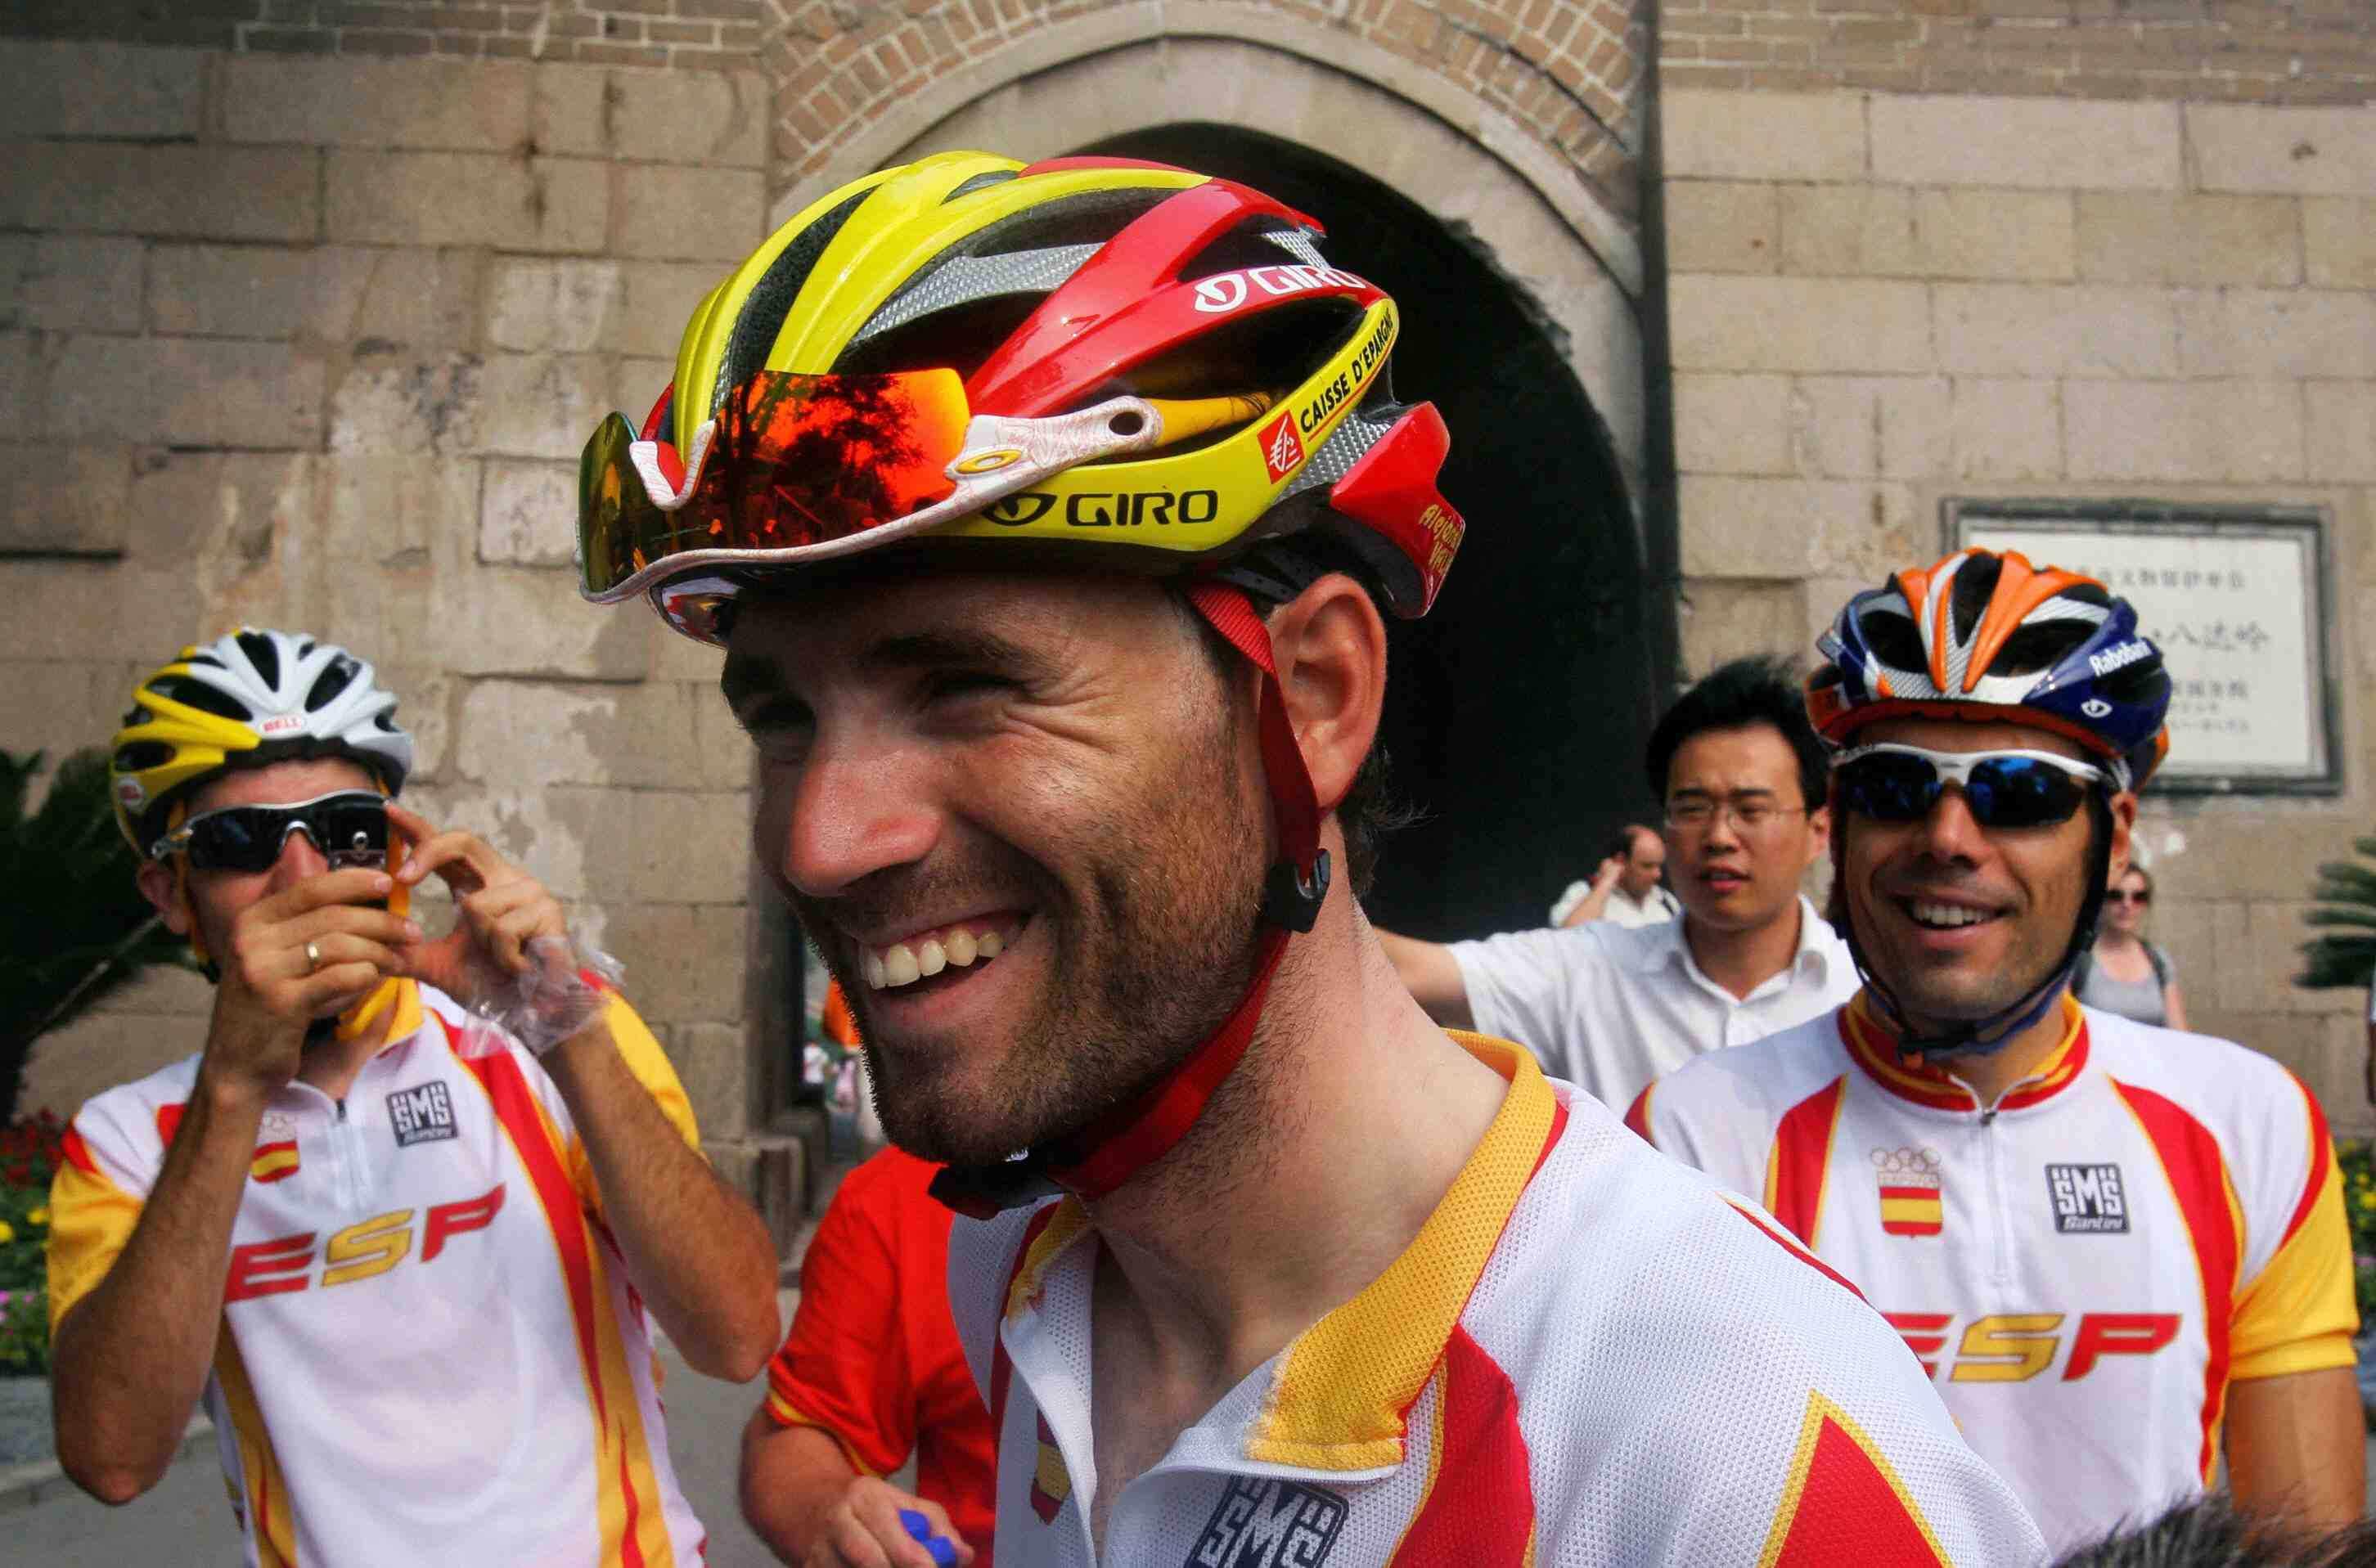 Spain's Alejandro Valverde (C) at the 2009 Beijing Olympic road race warm-ups.